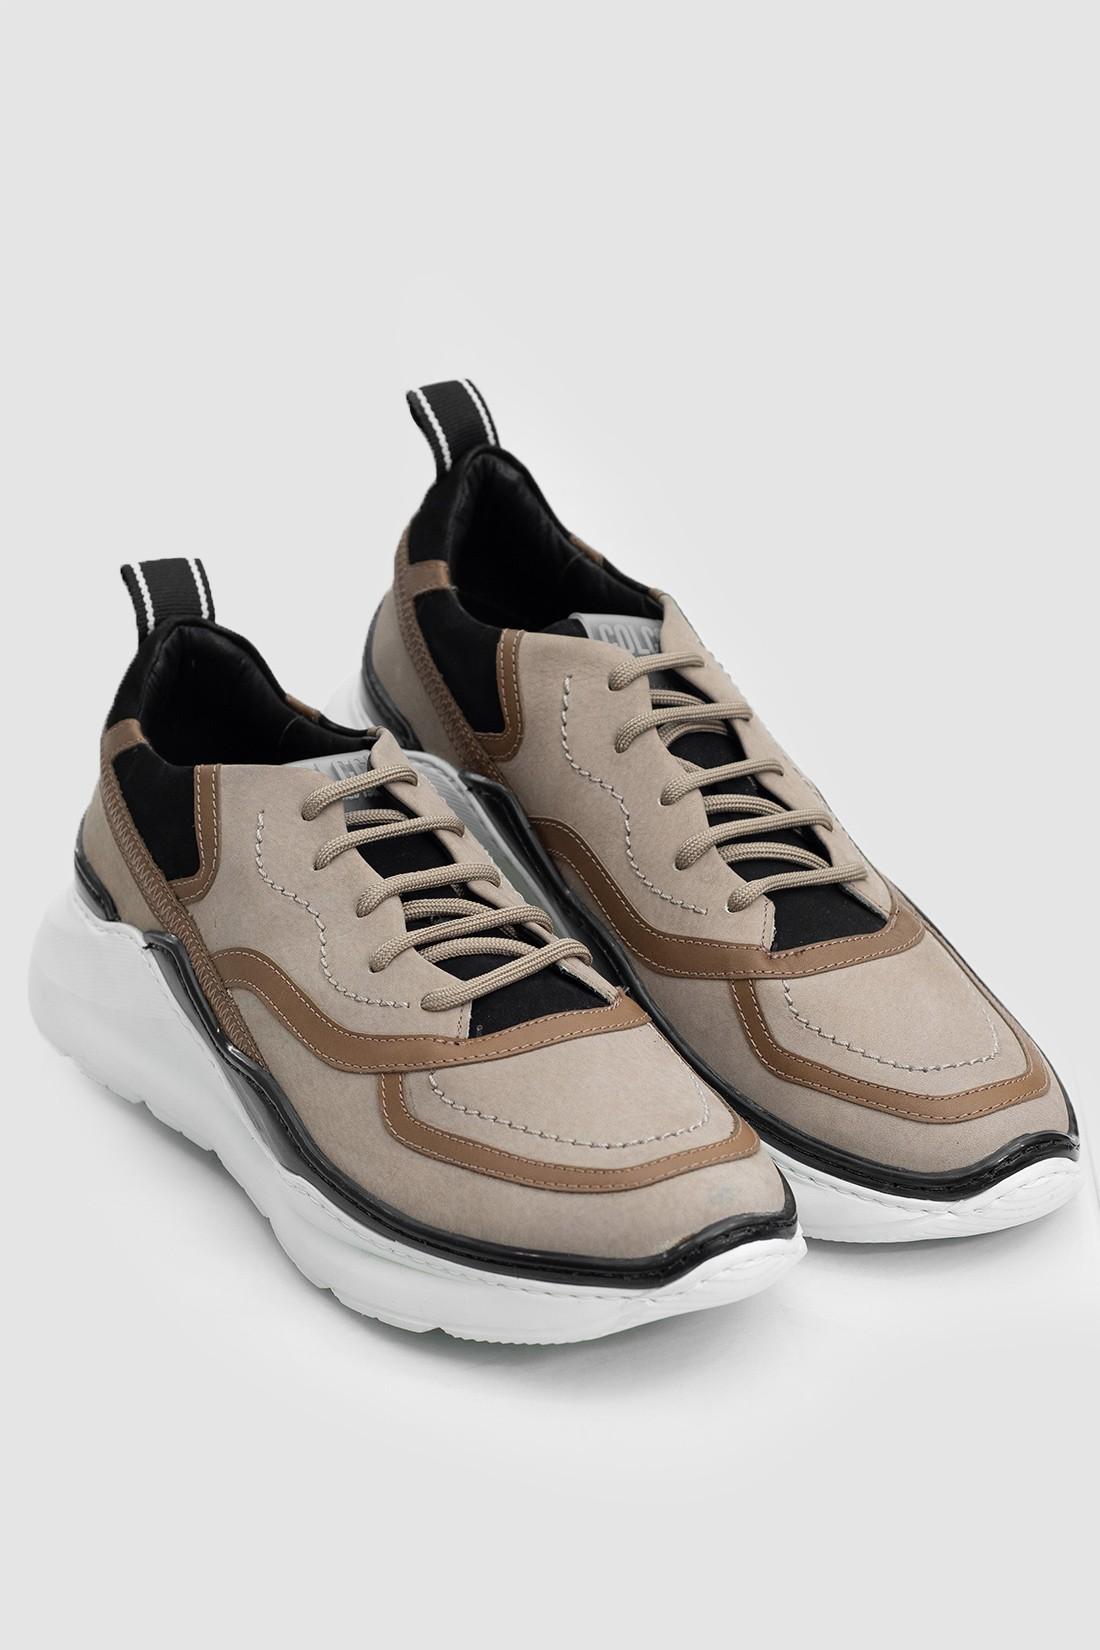 Tenis Masc Ugly Sneaker Colcci Civita Ginger